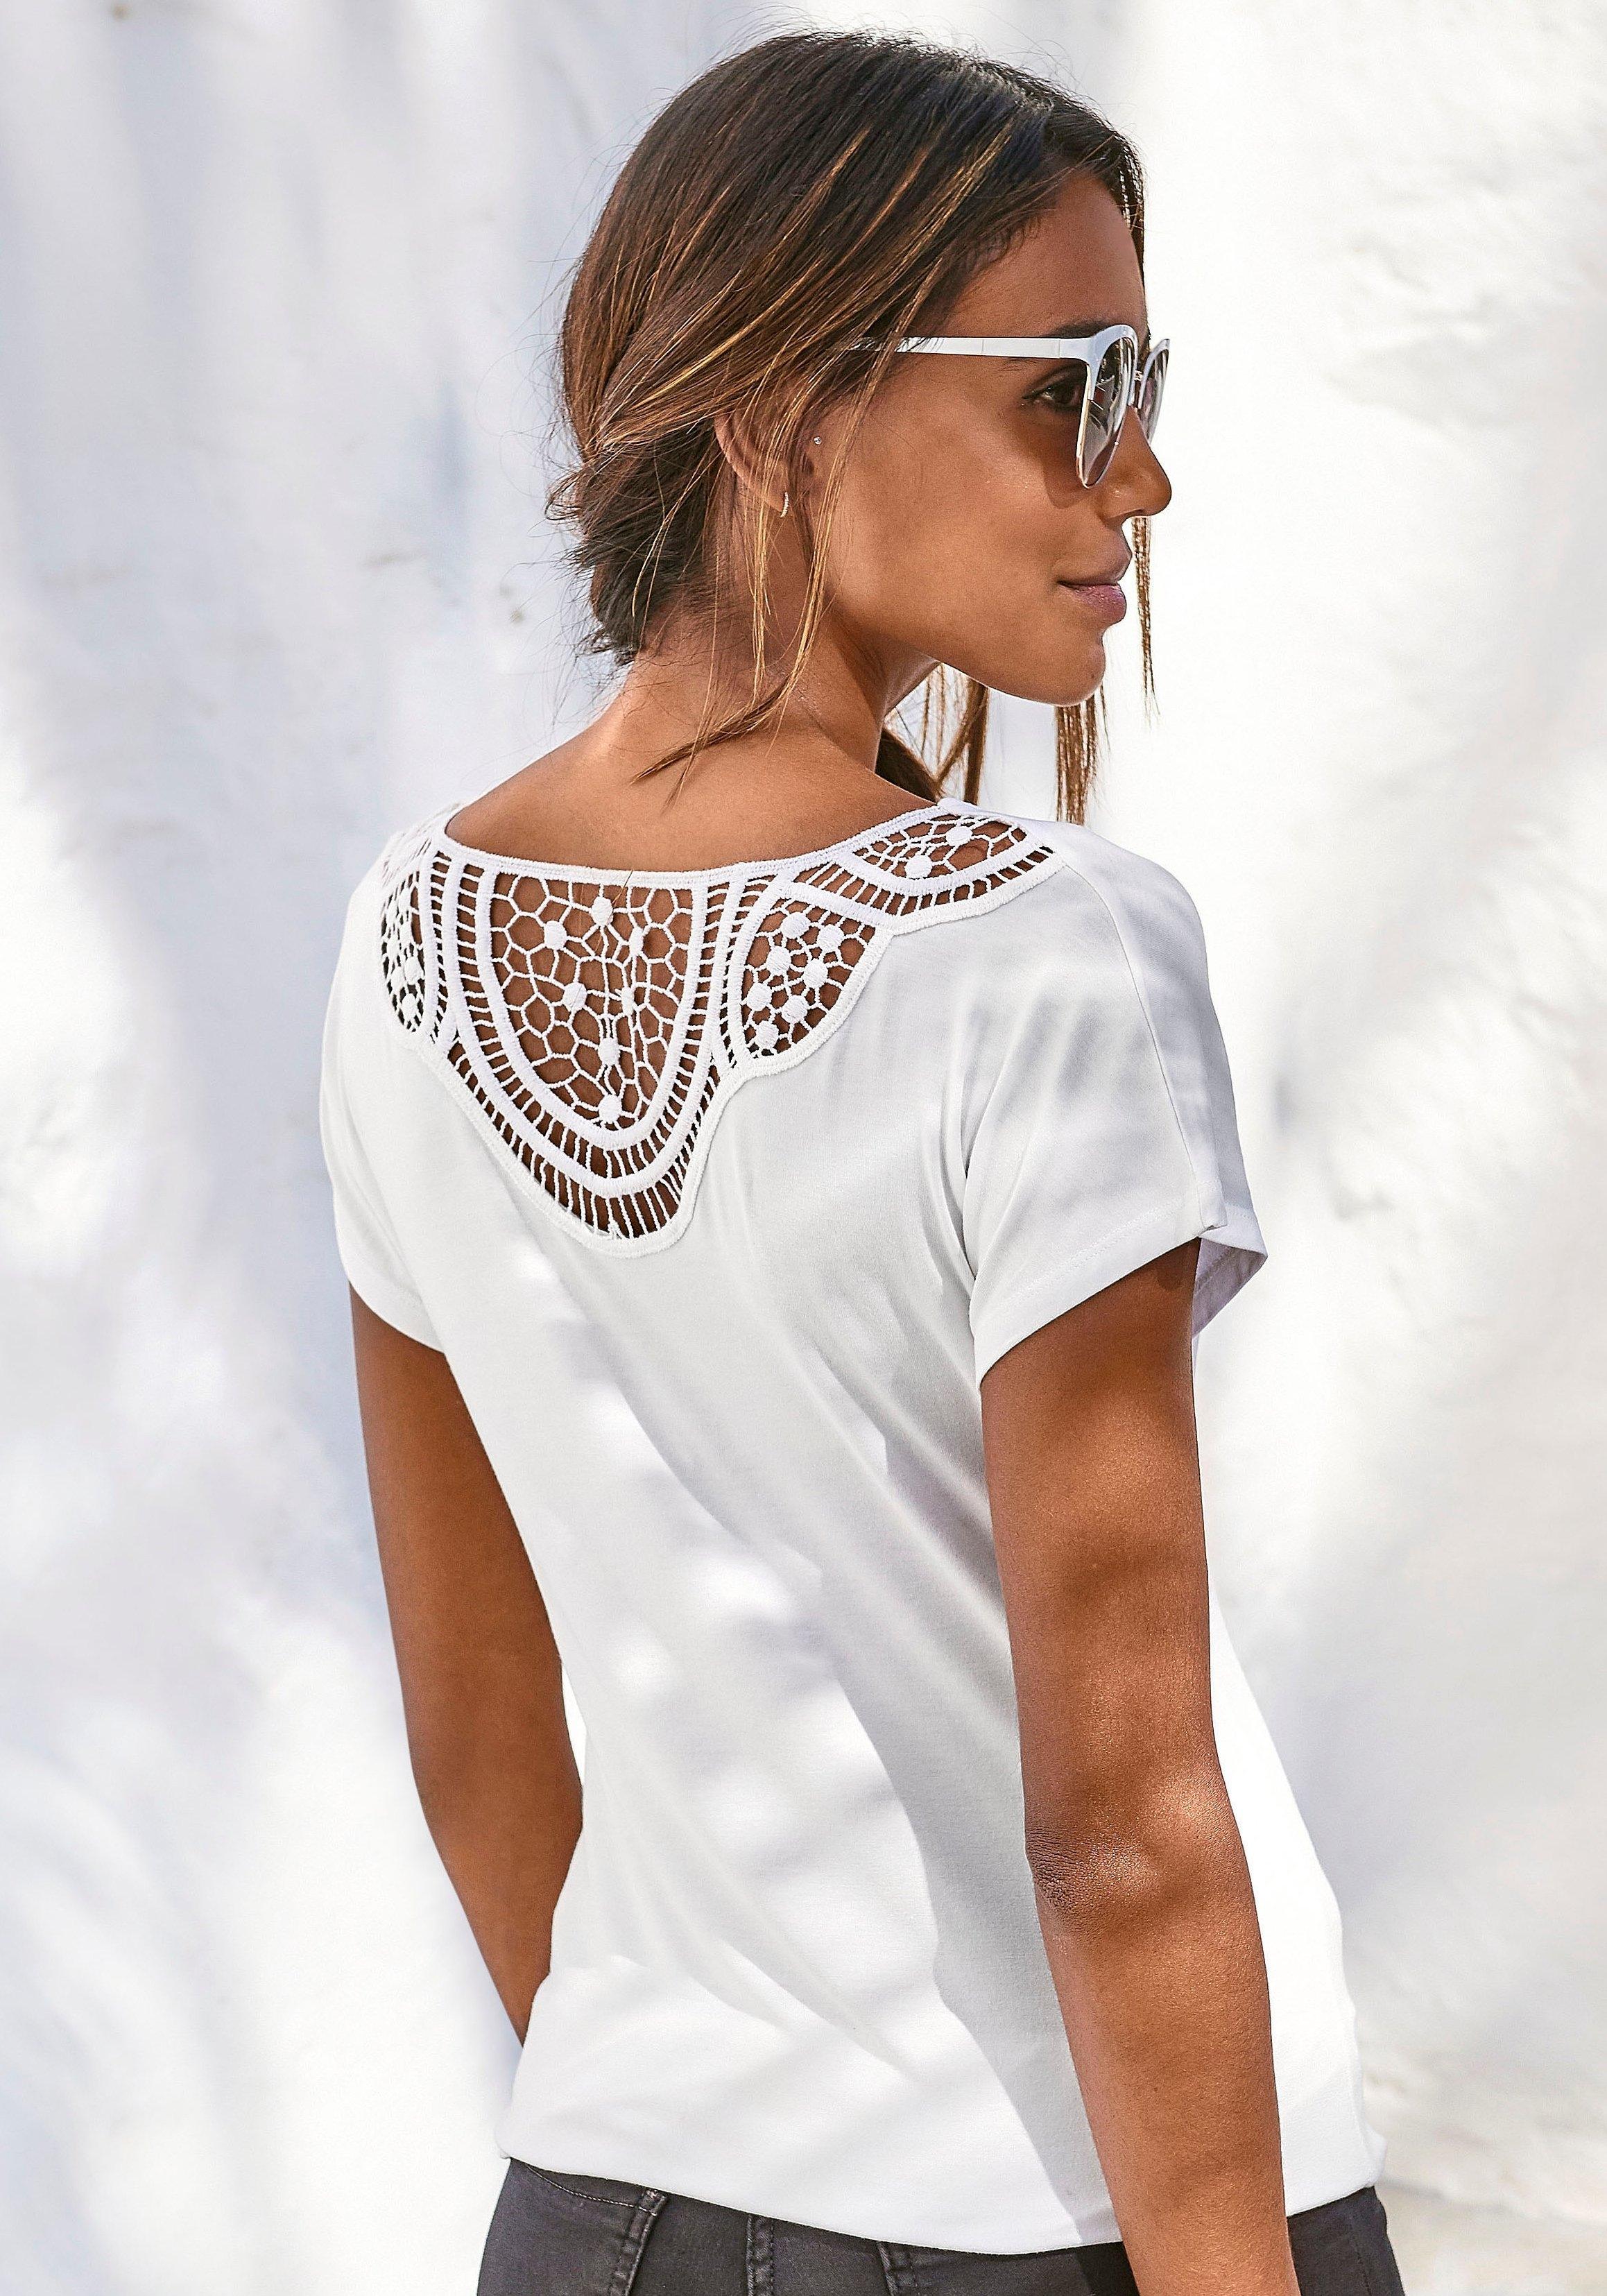 Vivance T-shirt met zachte gehaakte kant achter - verschillende betaalmethodes